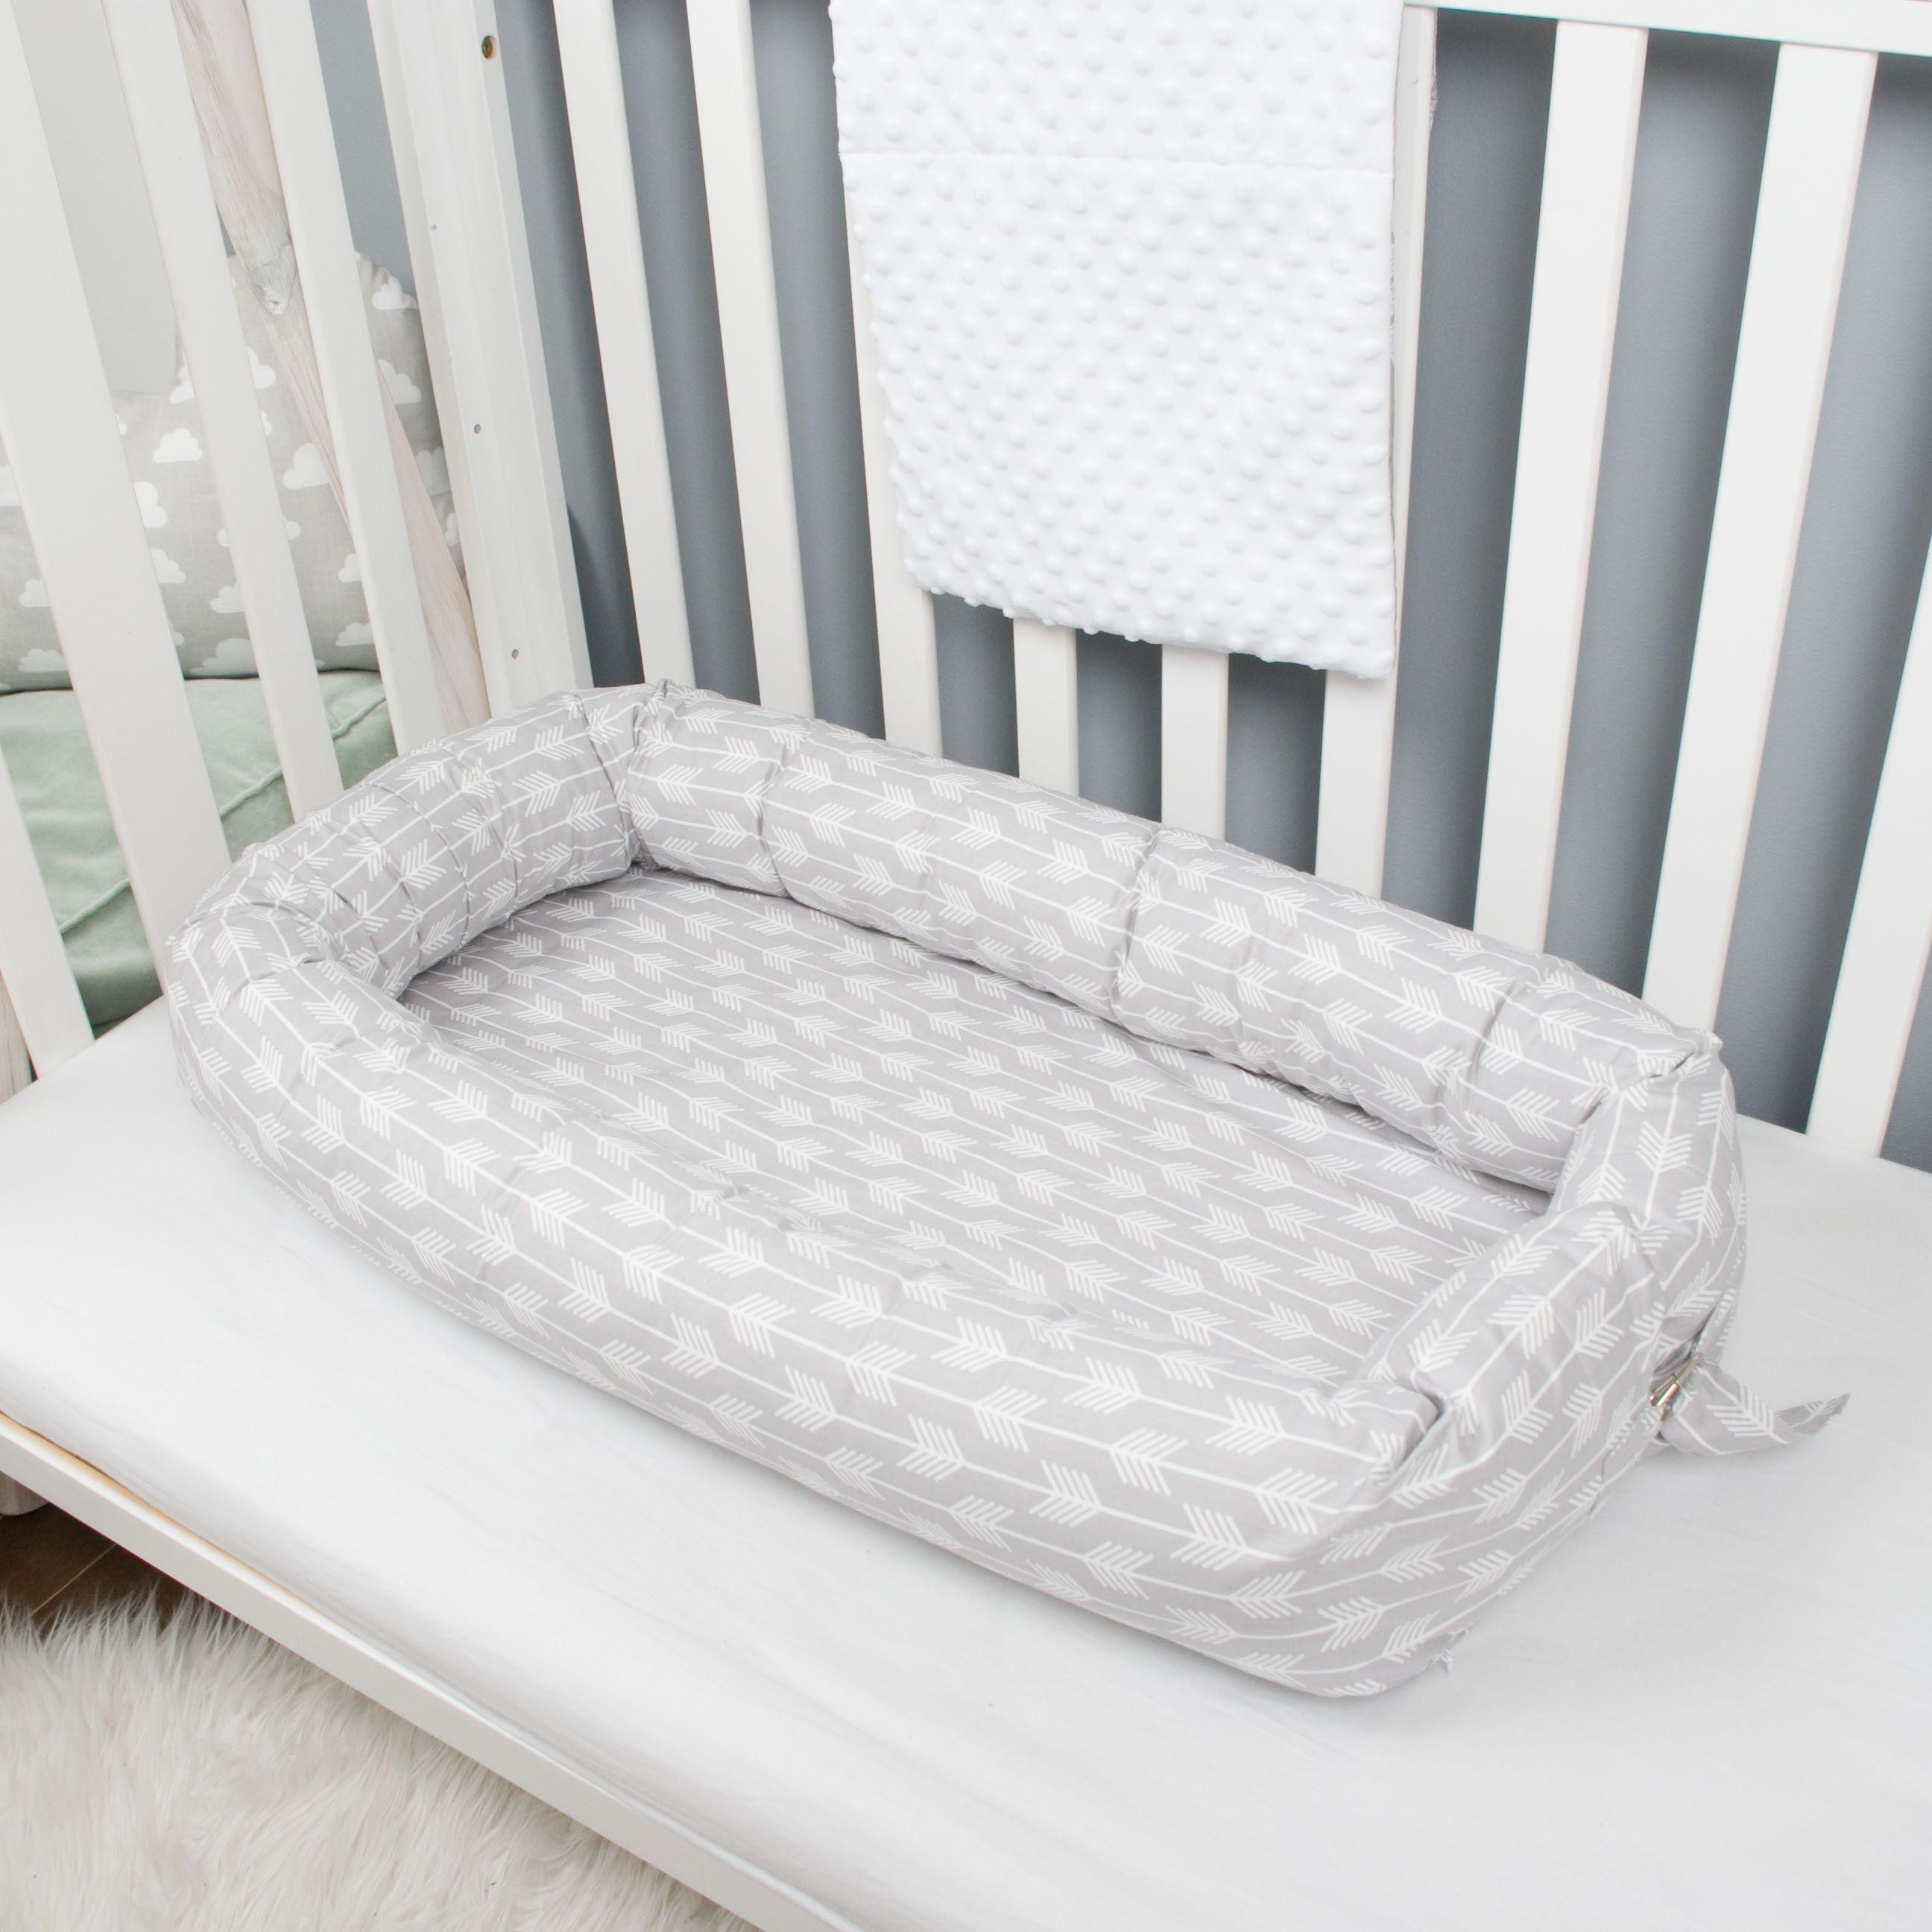 Arrows Any Size Nest Toddler Nest Bed Baby Nest Newborn Babynest